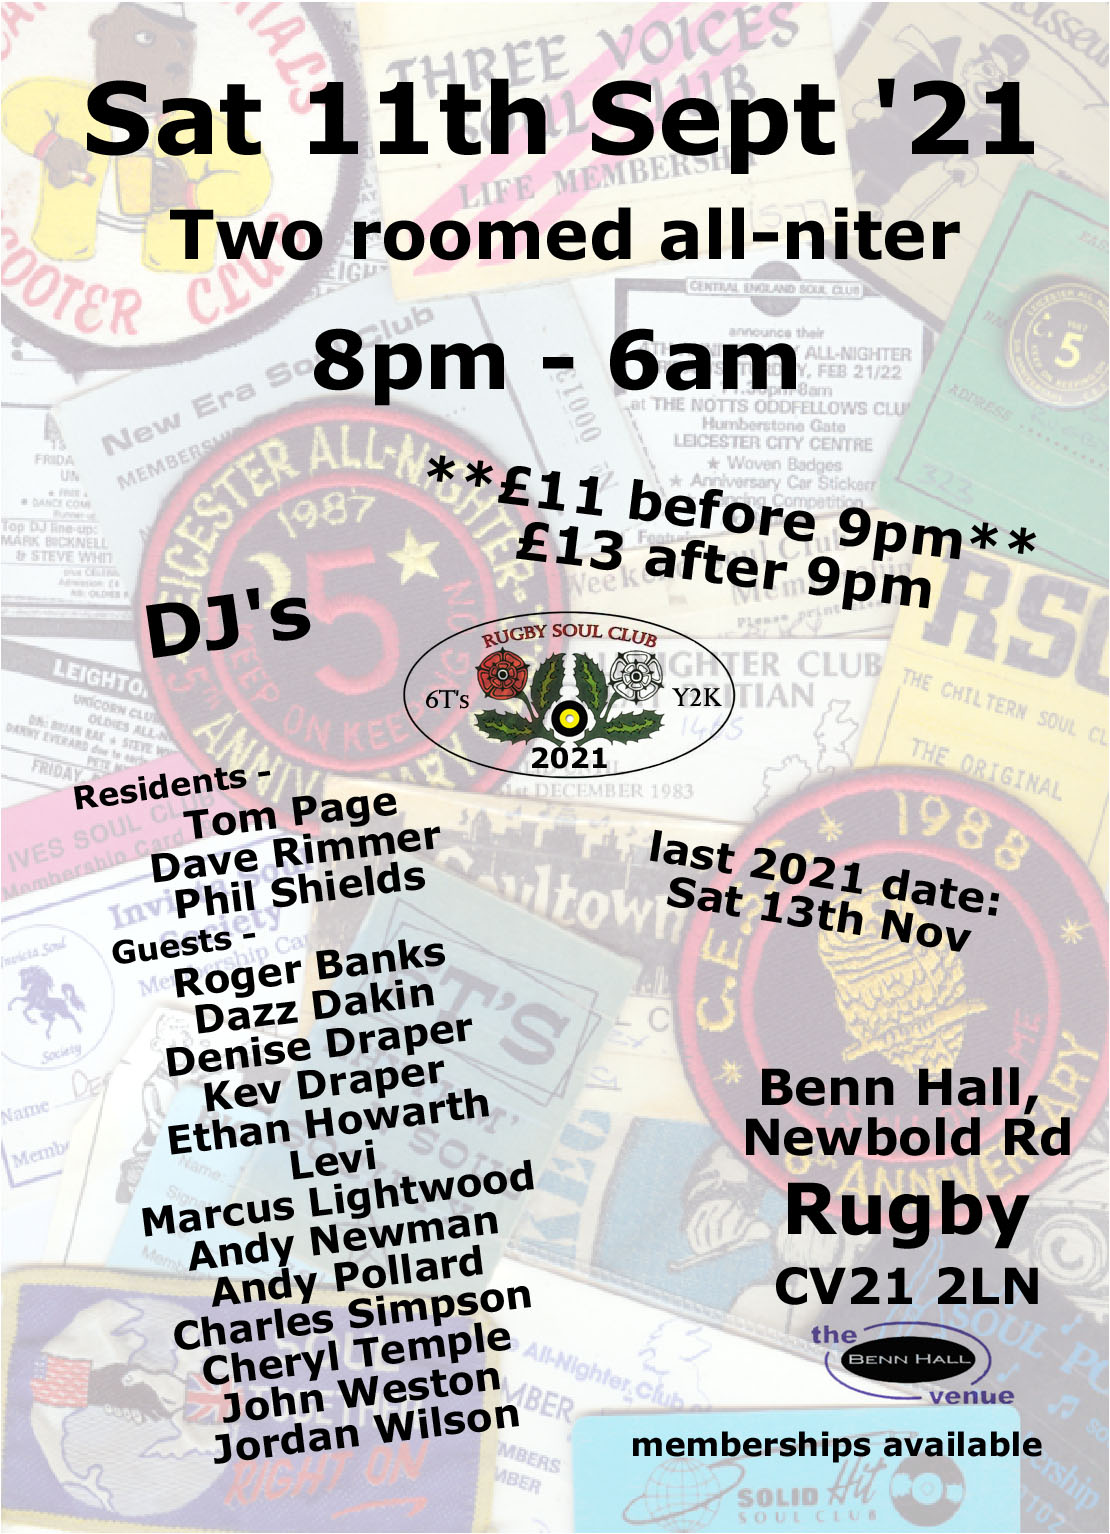 Rugby Soul Club Allniters At The Benn Hall flyer